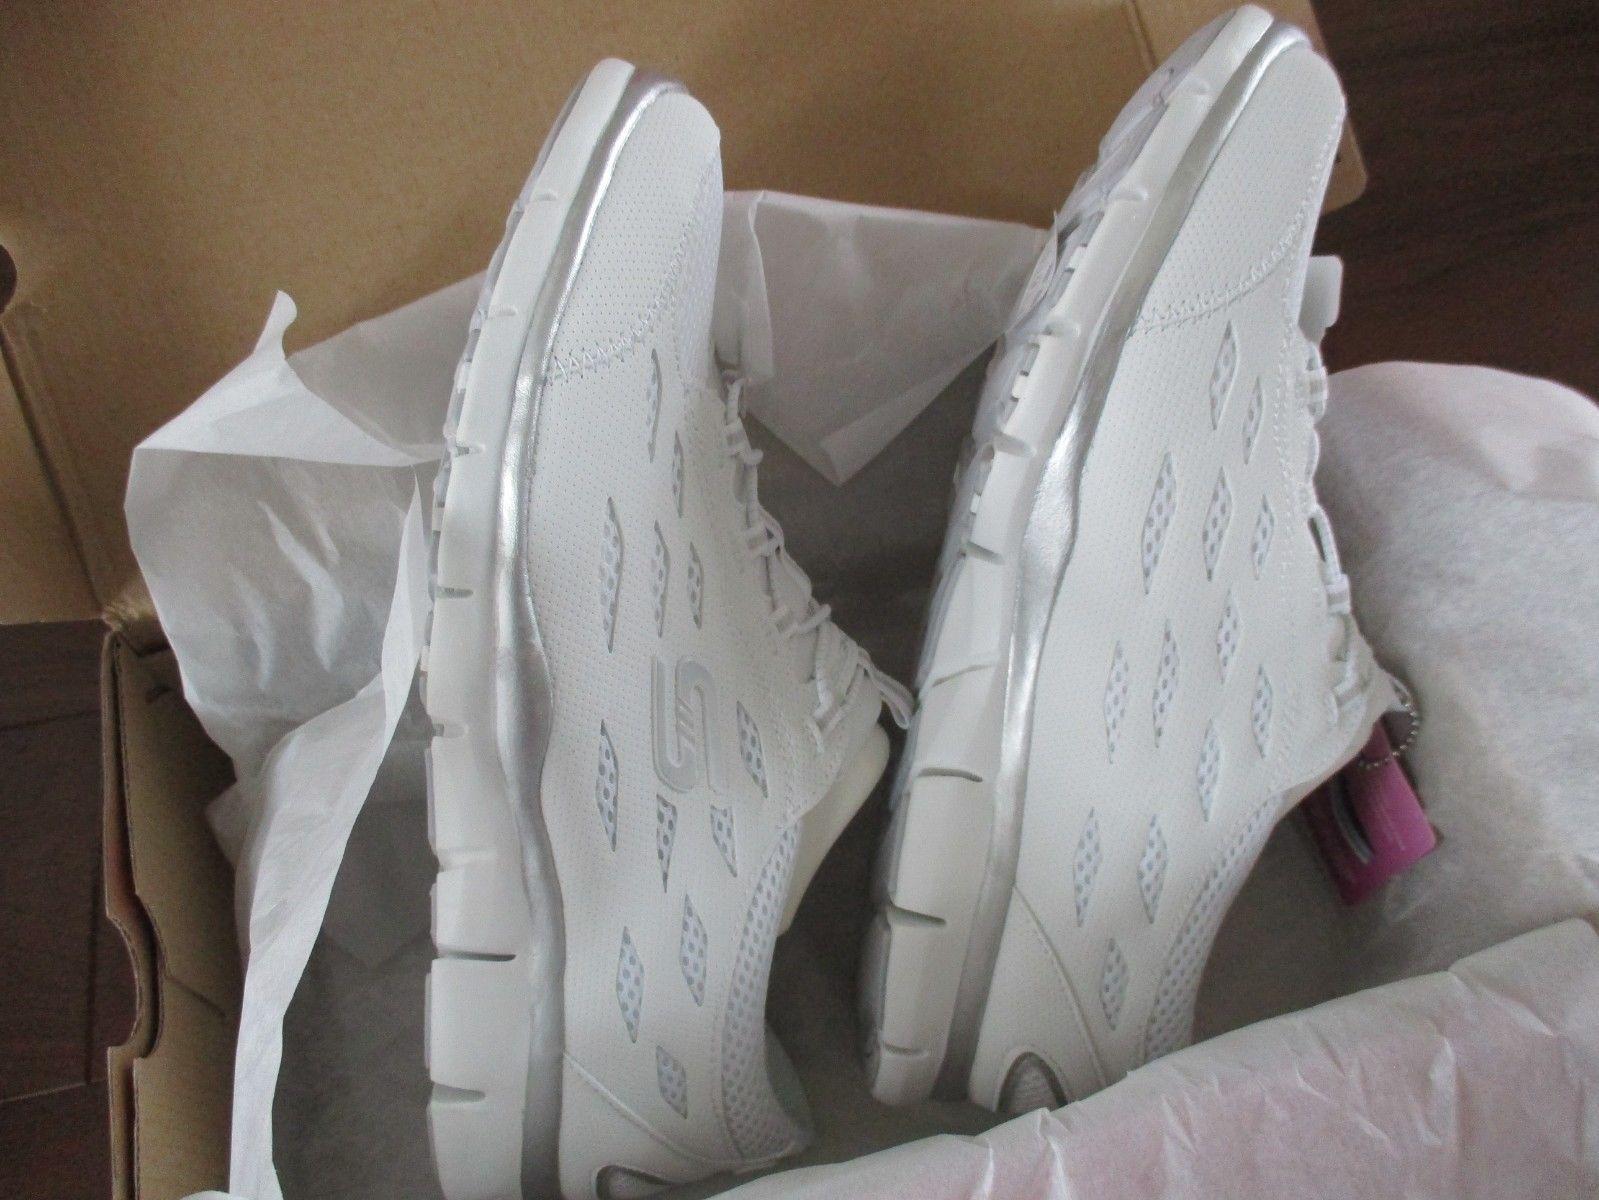 BNIB Skechers Gratis-Going Places Women Sneakers, Slip-on, White, size 11, 22603